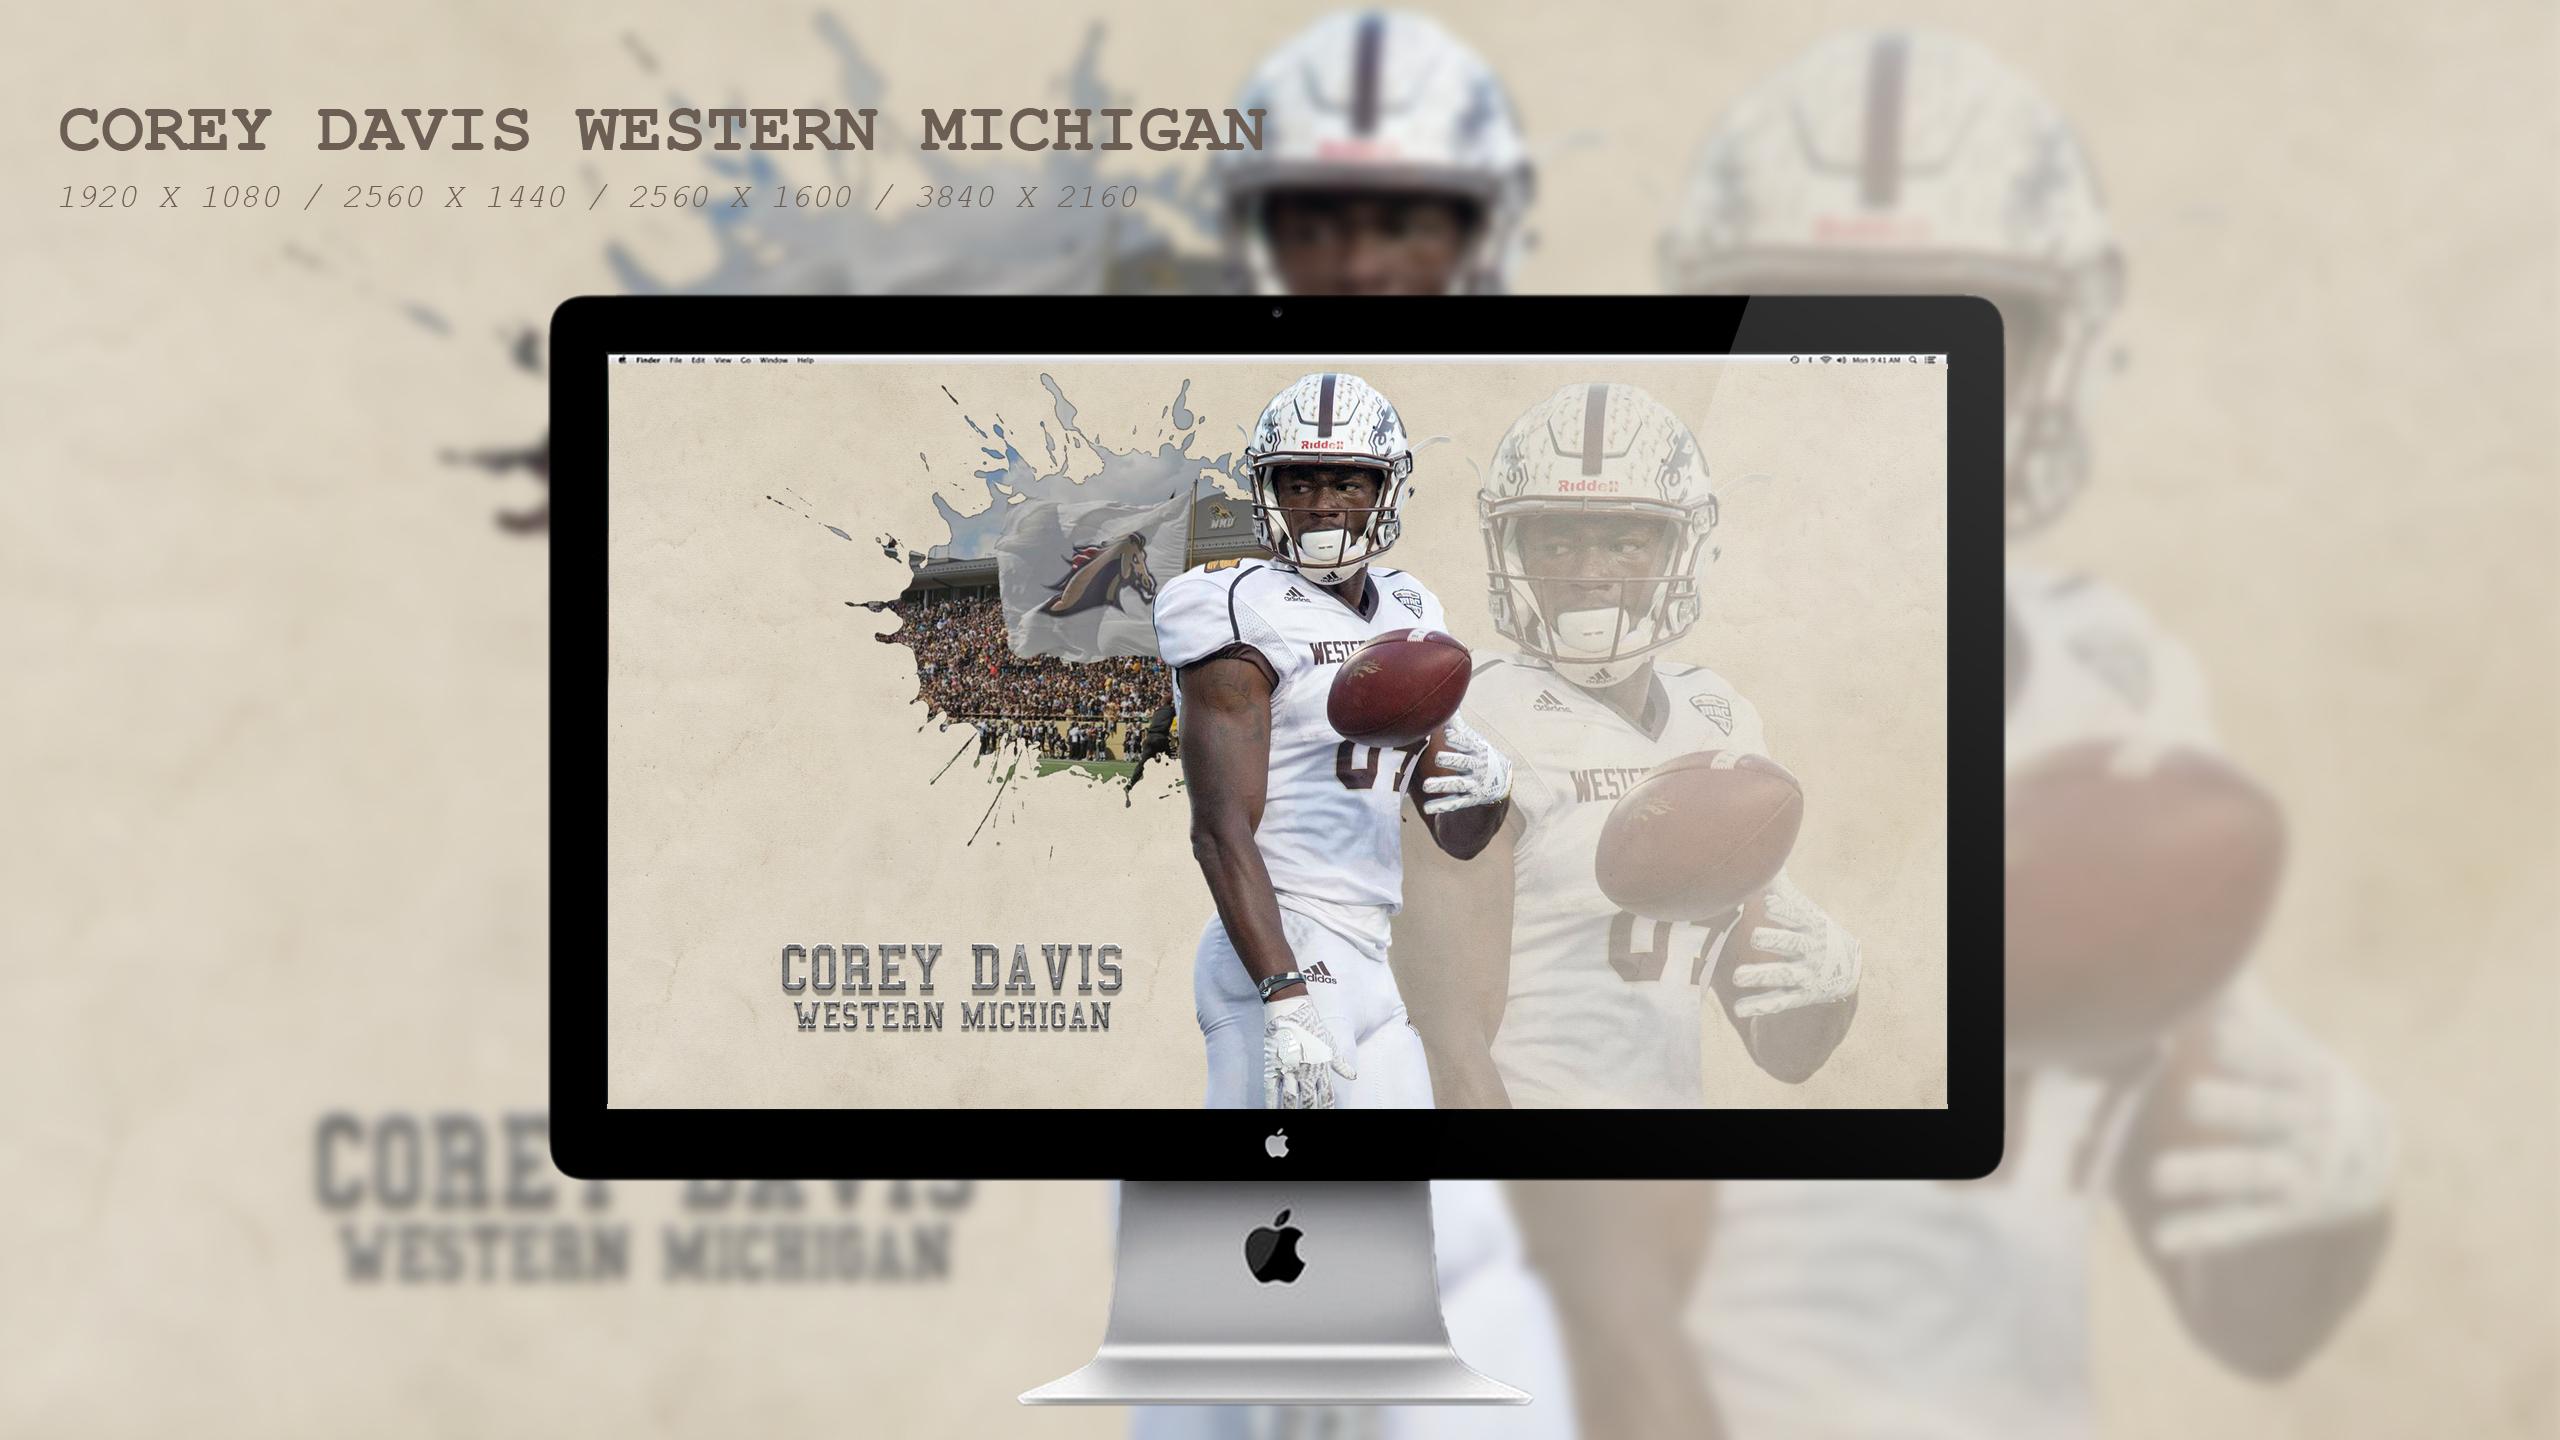 Corey Davis Western Michigan Wallpaper HD by BeAware8